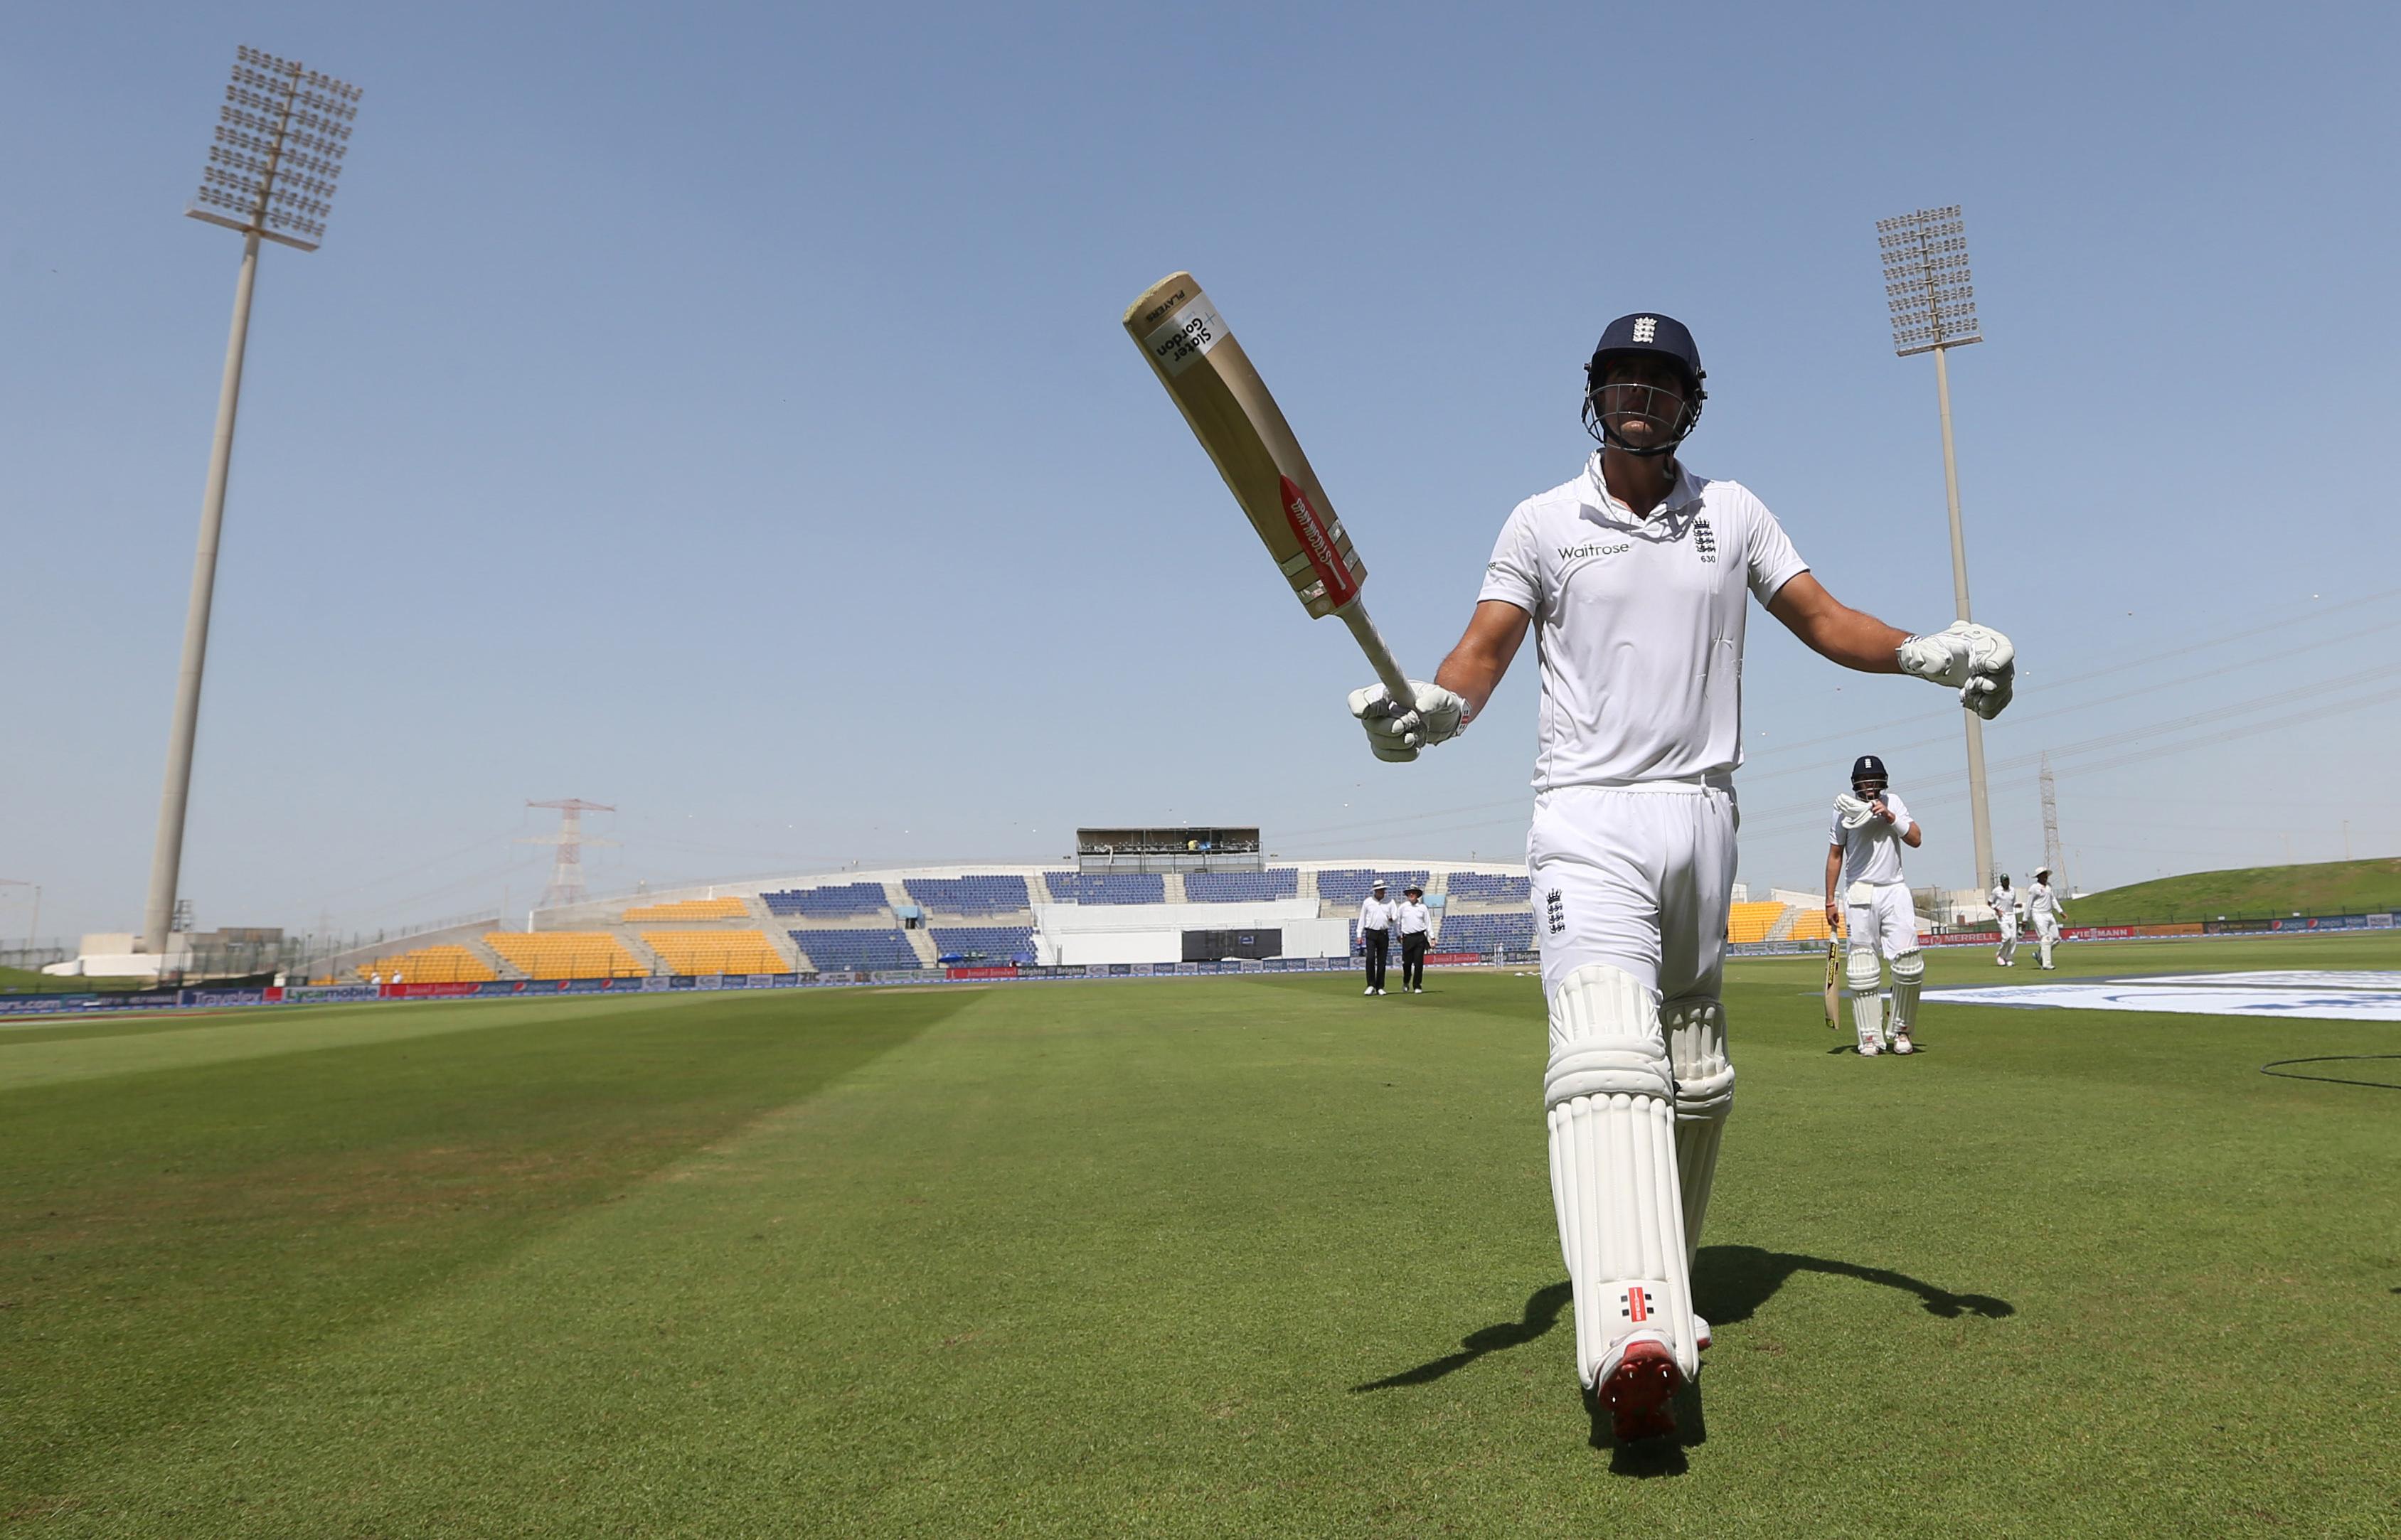 Cricket - Pakistan v England - First Test - Zayed Cricket Stadium, Abu Dhabi, United Arab Emirates - 16/10/15nEngland's Alastair Cook walks off unbeaten at lunchnAction Images via Reuters / Jason O'BriennLivepic